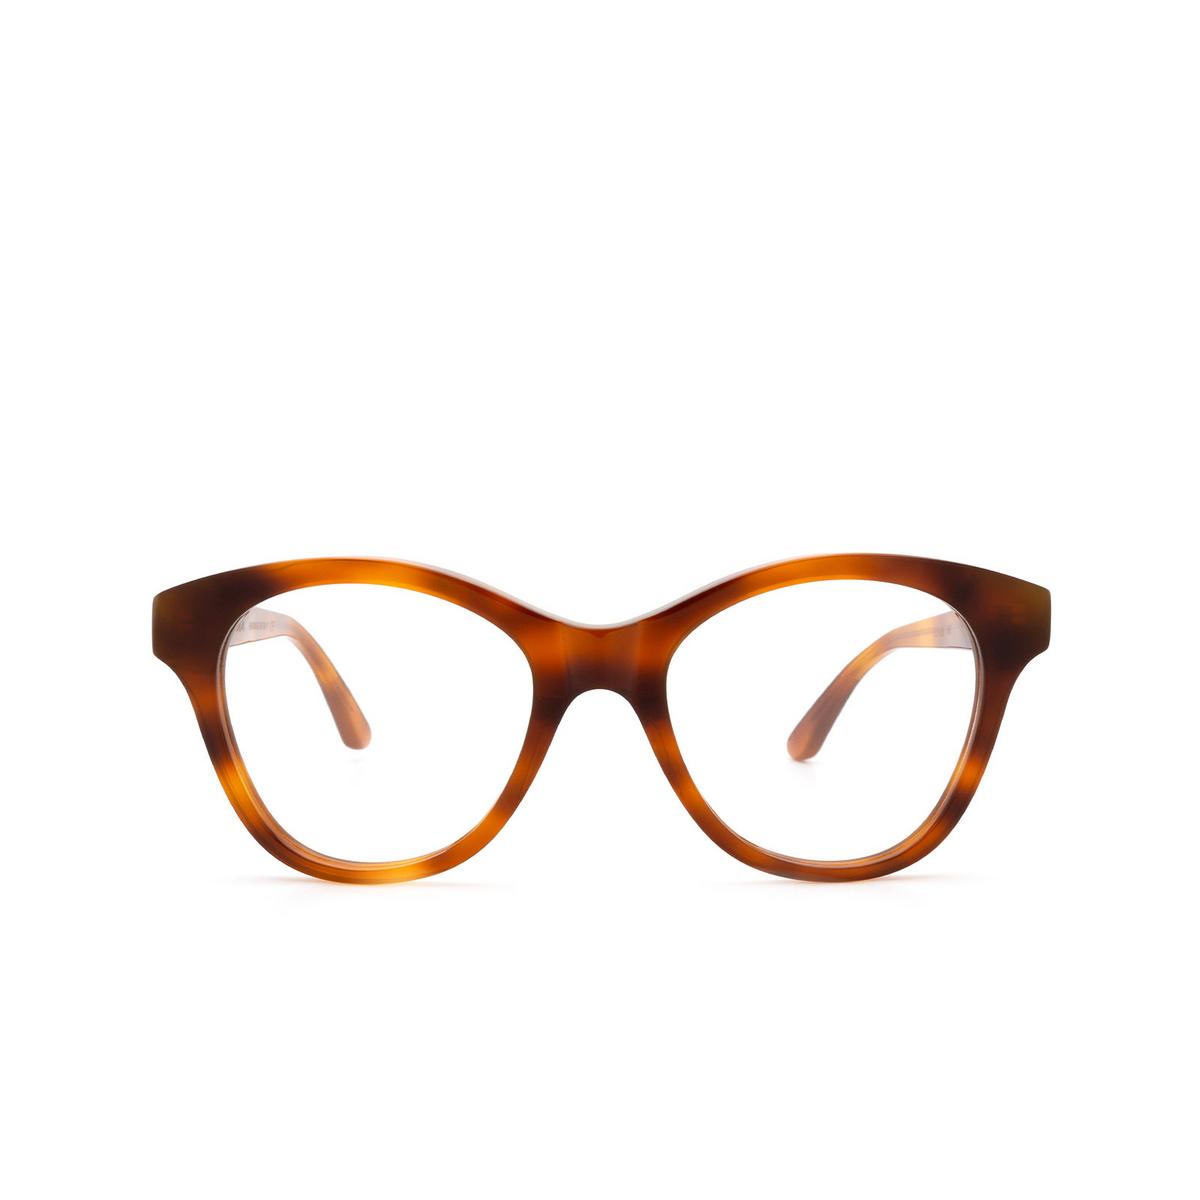 Huma® Cat-eye Eyeglasses: Mia color Light Havana 01V - front view.